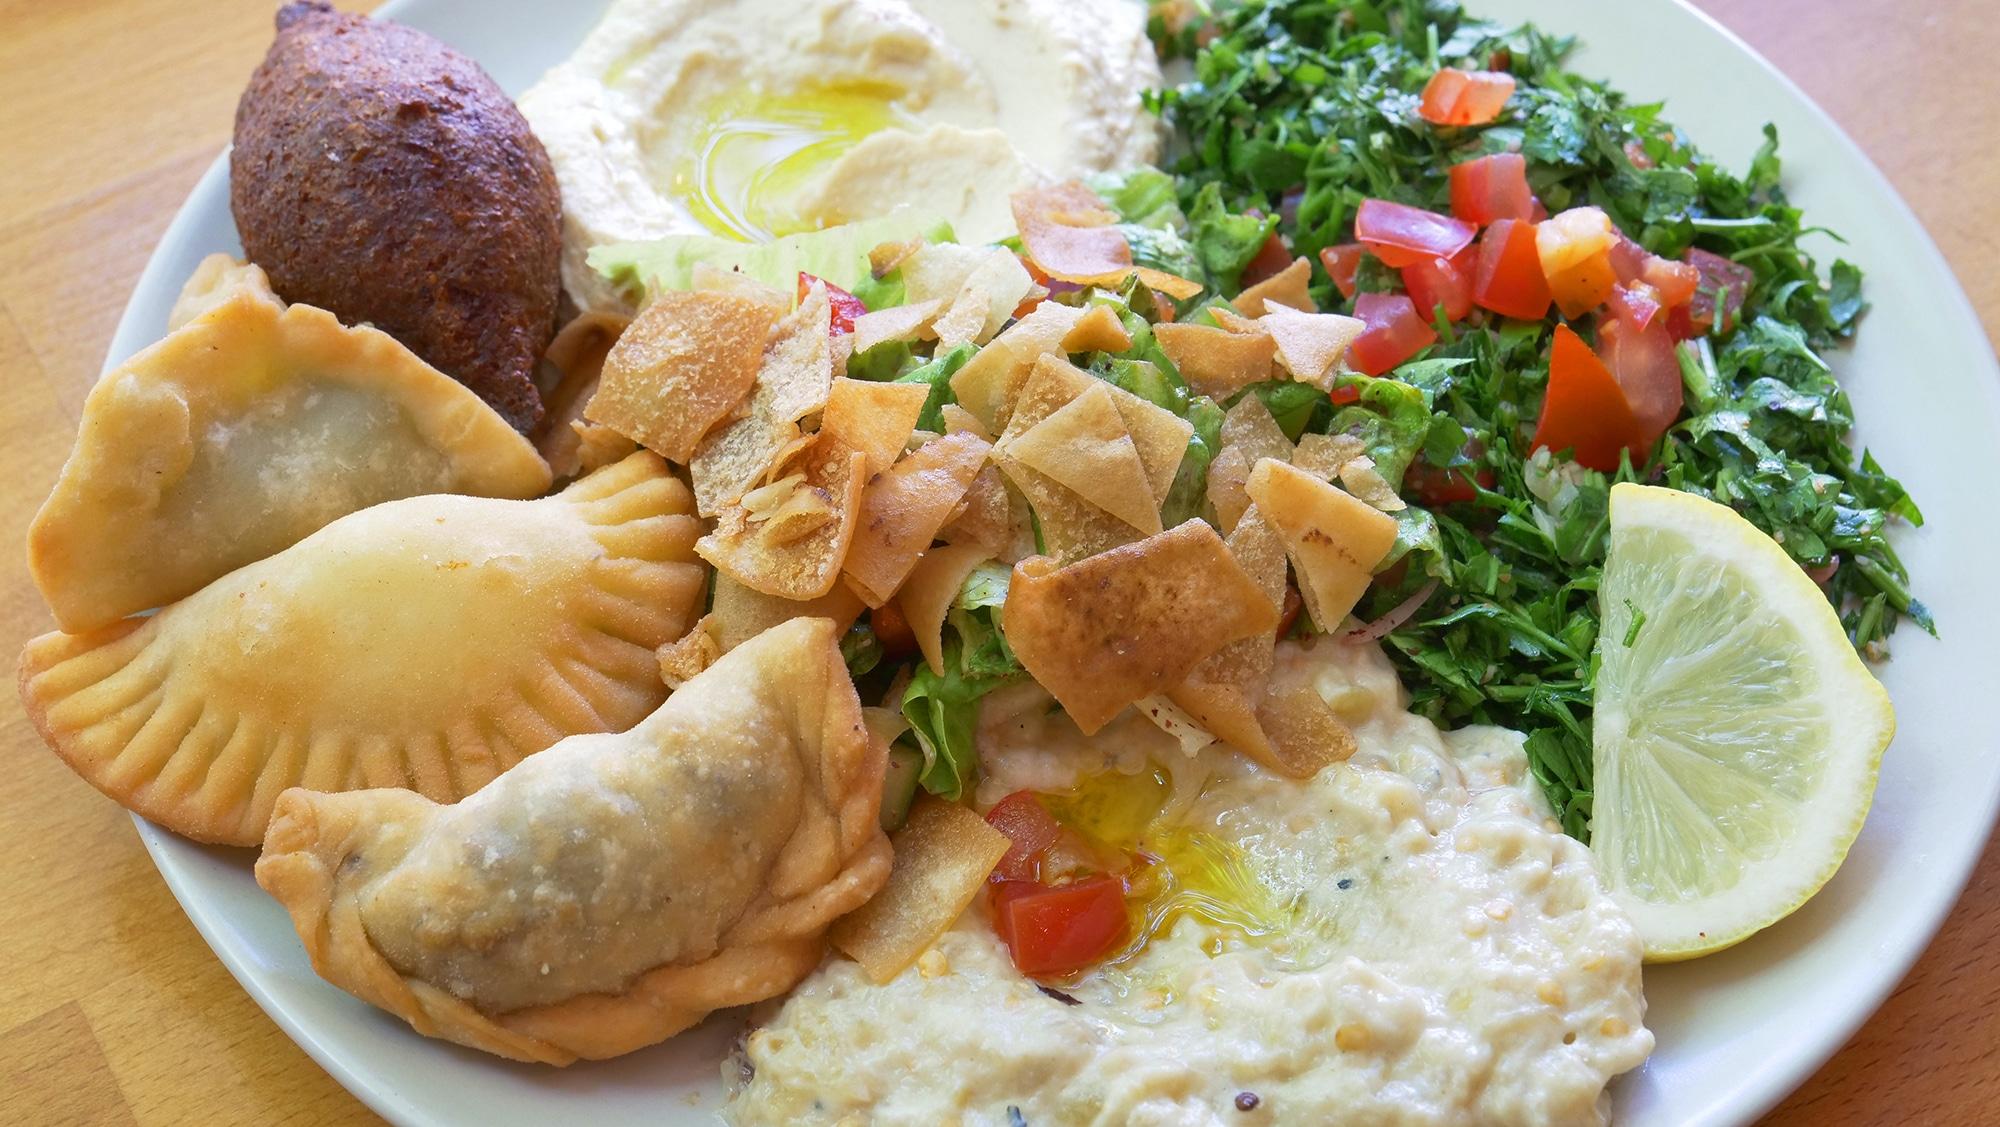 assiette-vegetarienne-libanais-montrouge-2.jpg